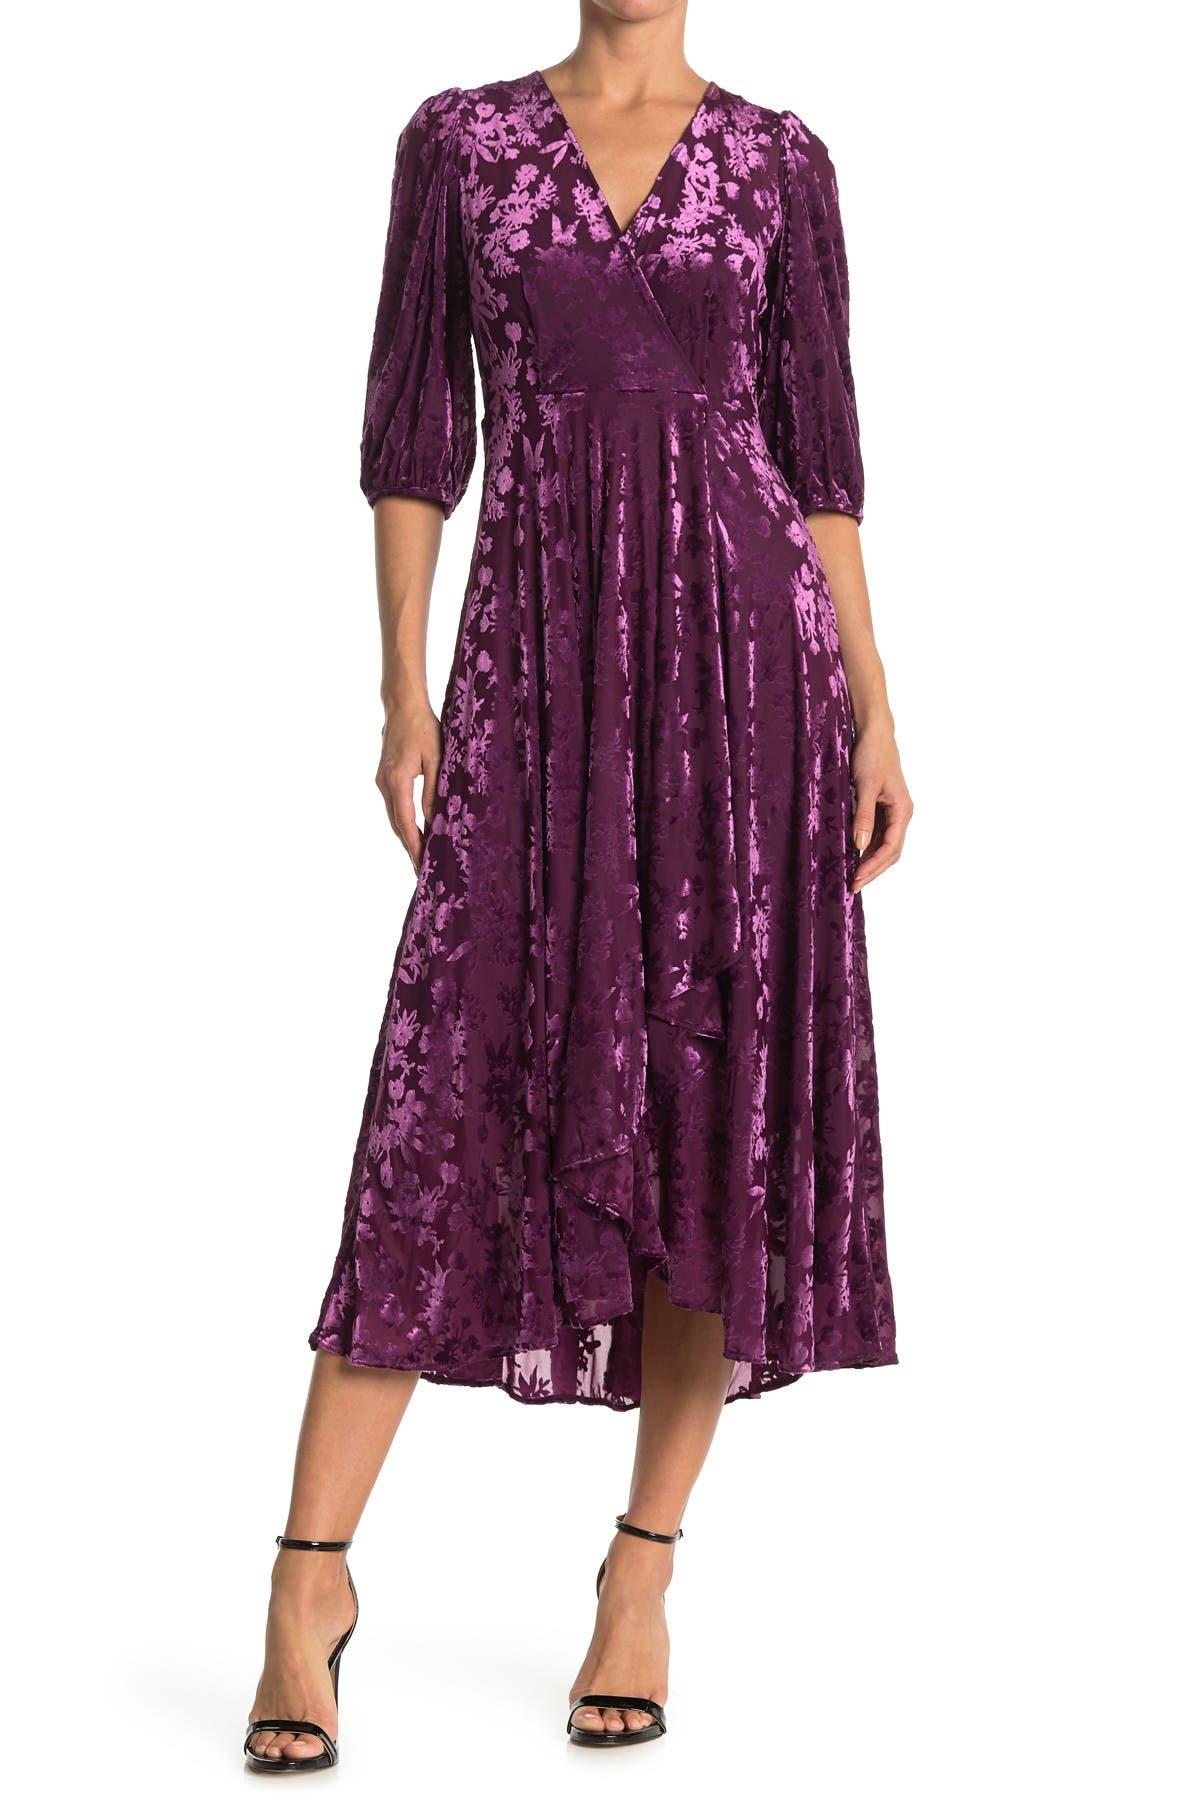 Image of Calvin Klein Burnout Velvet Wrap Style Midi Dress